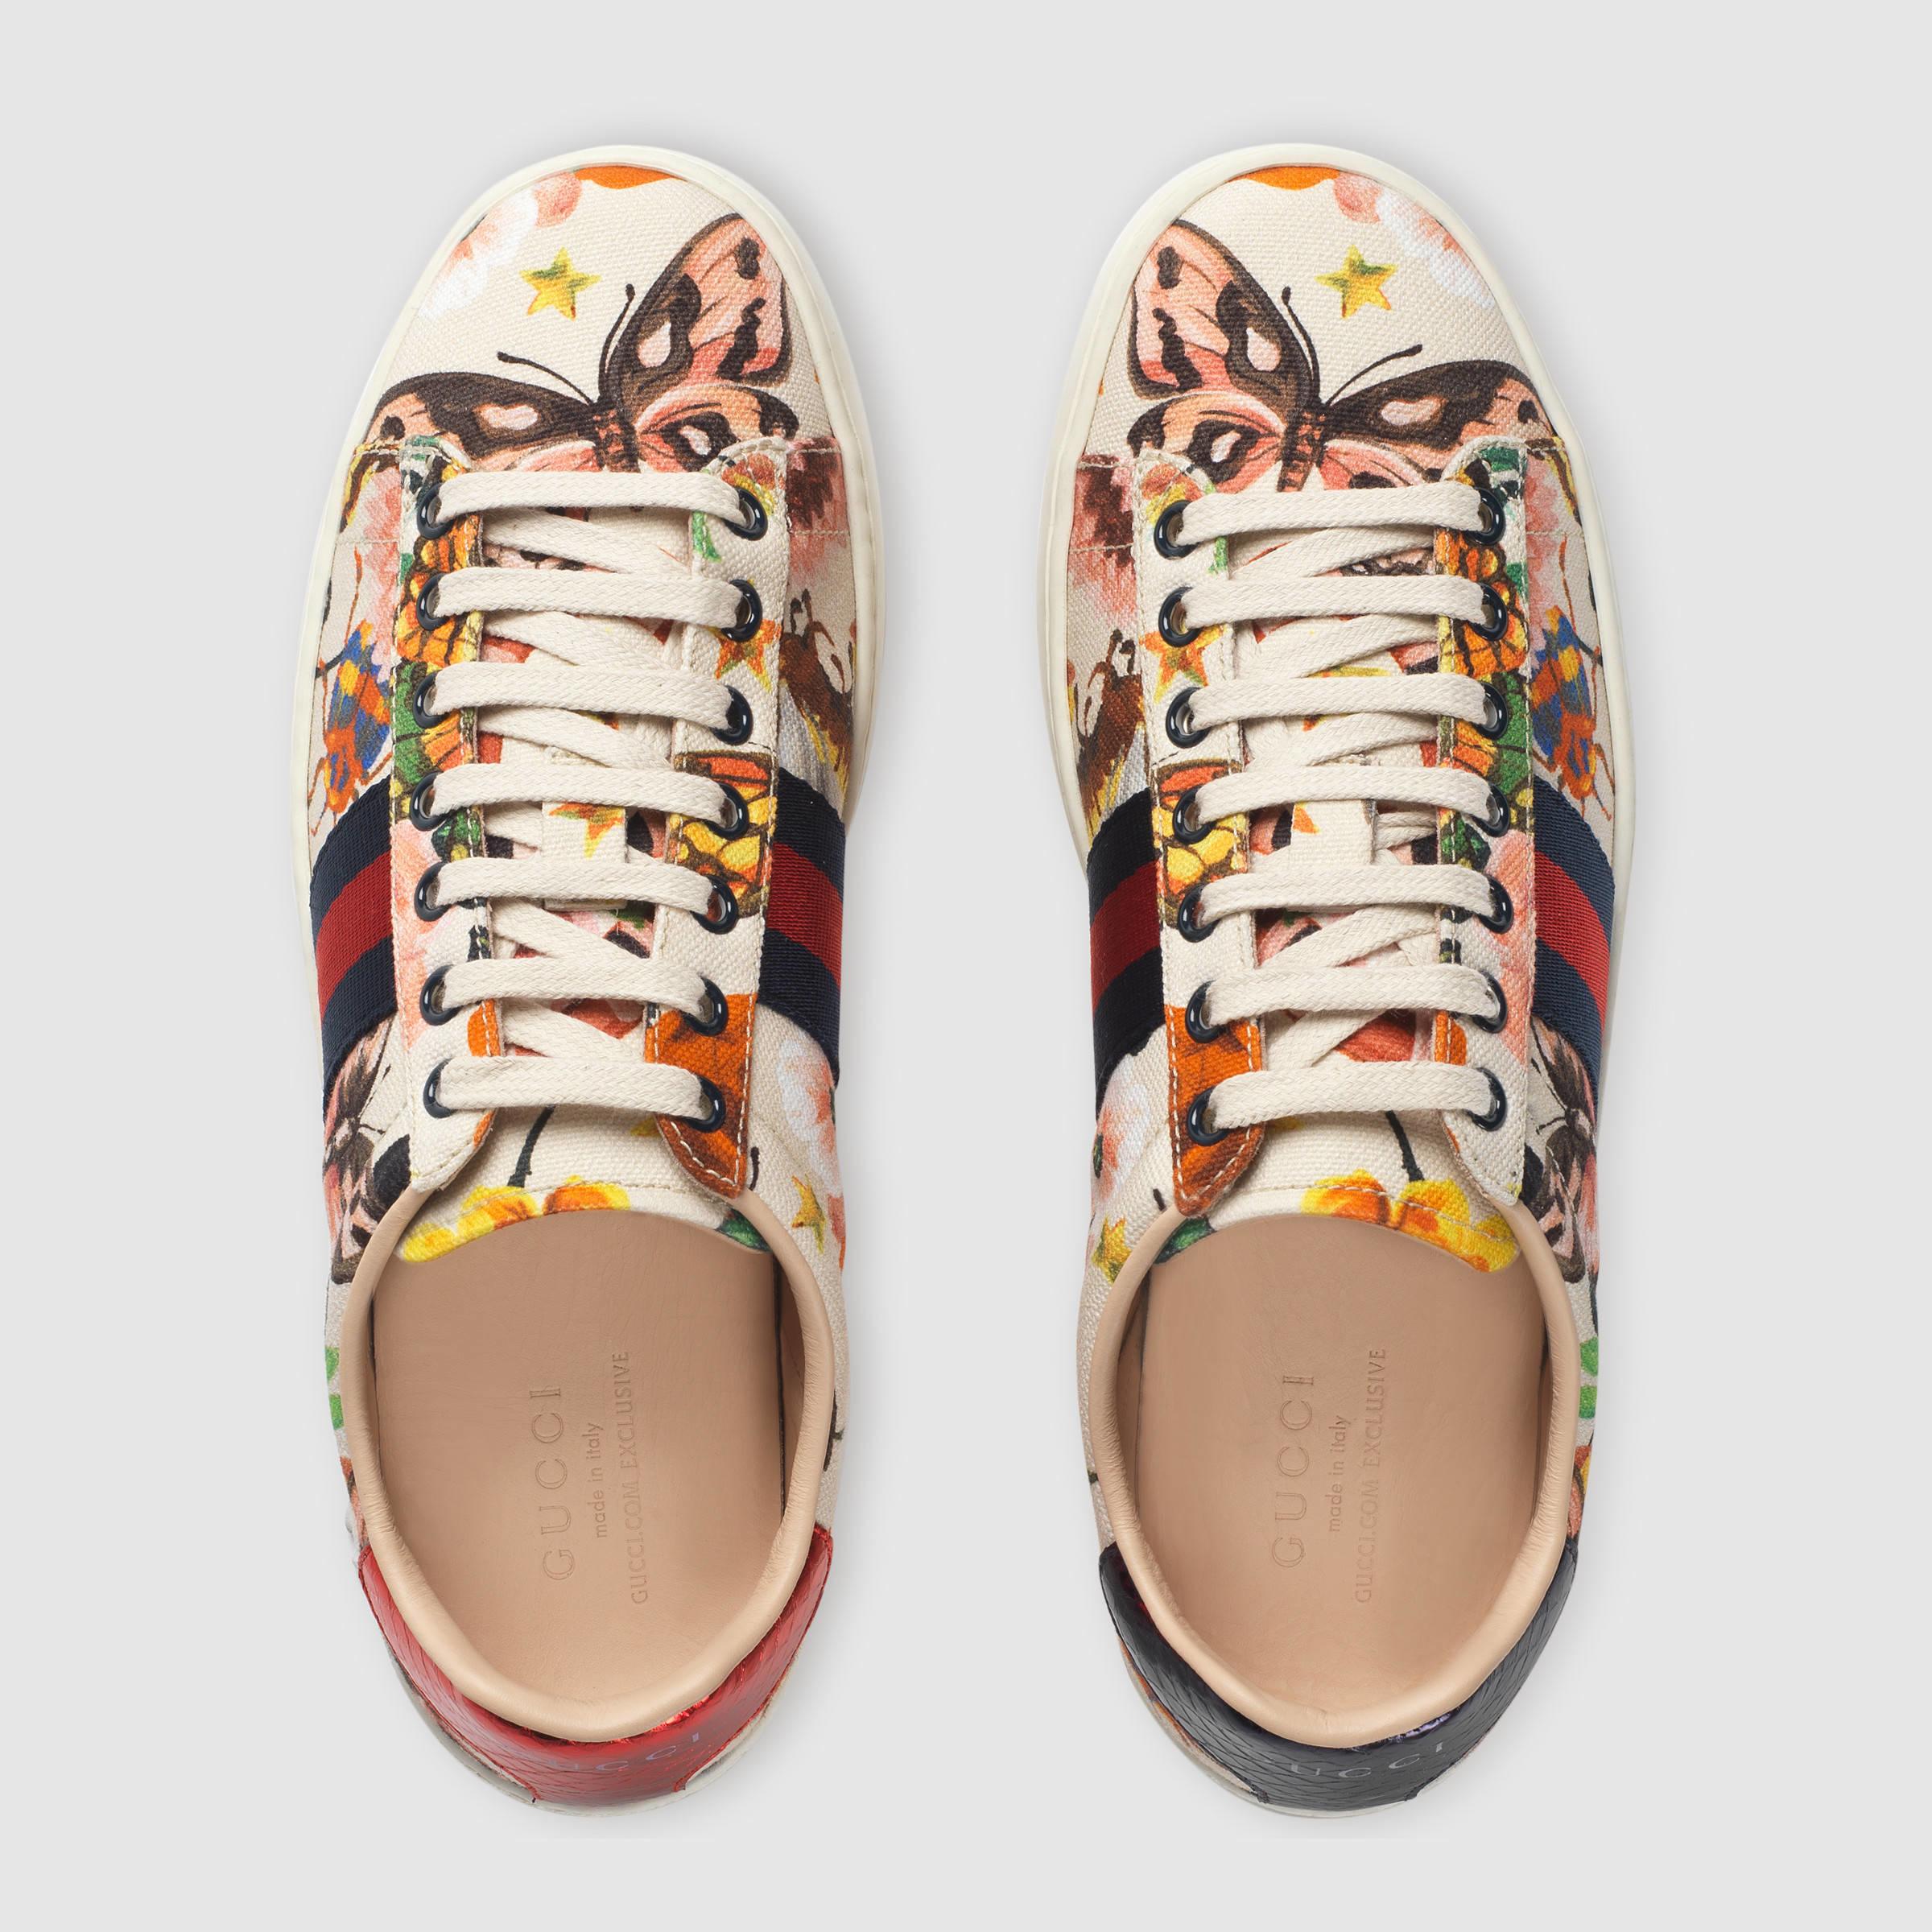 1aaaf8fb37fc Lyst - Gucci Garden Exclusive Ace Sneaker